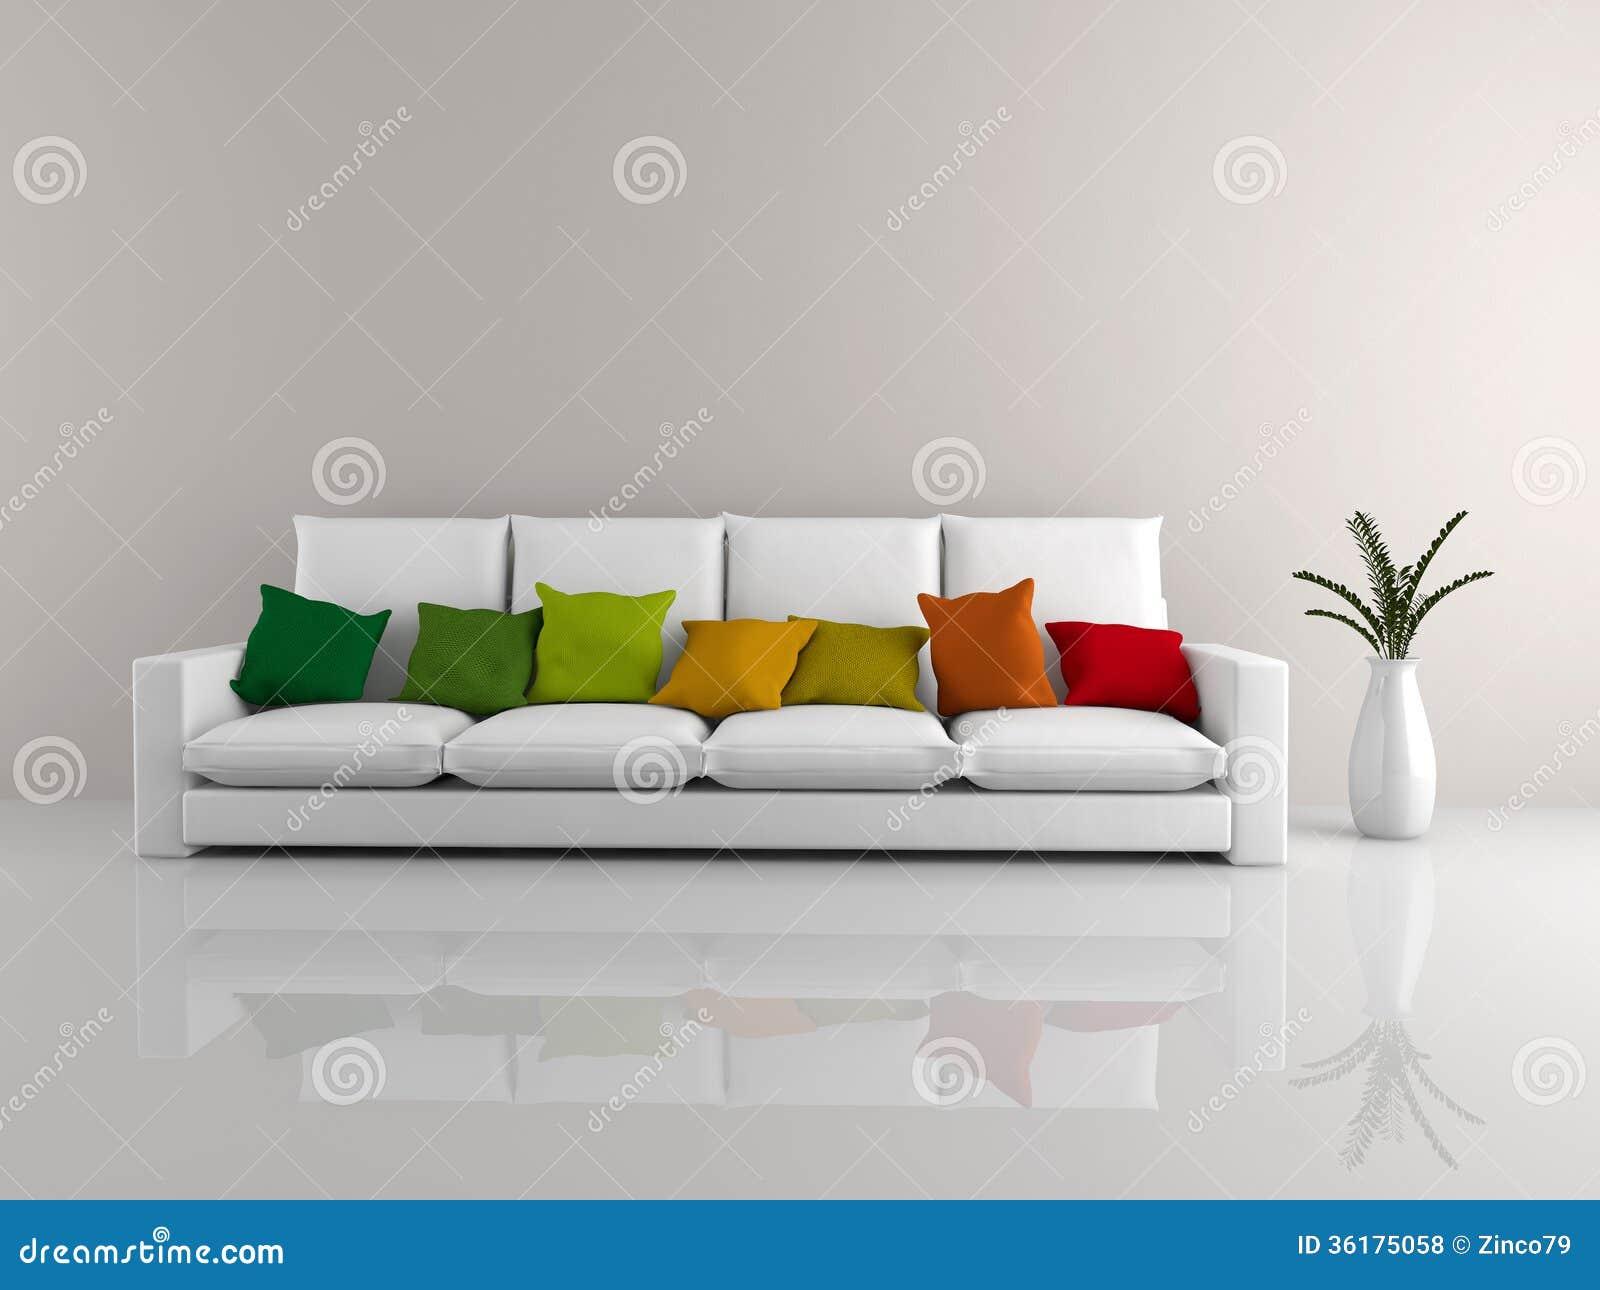 Minimalist Sofa White Illustration 36175058 Megapixl